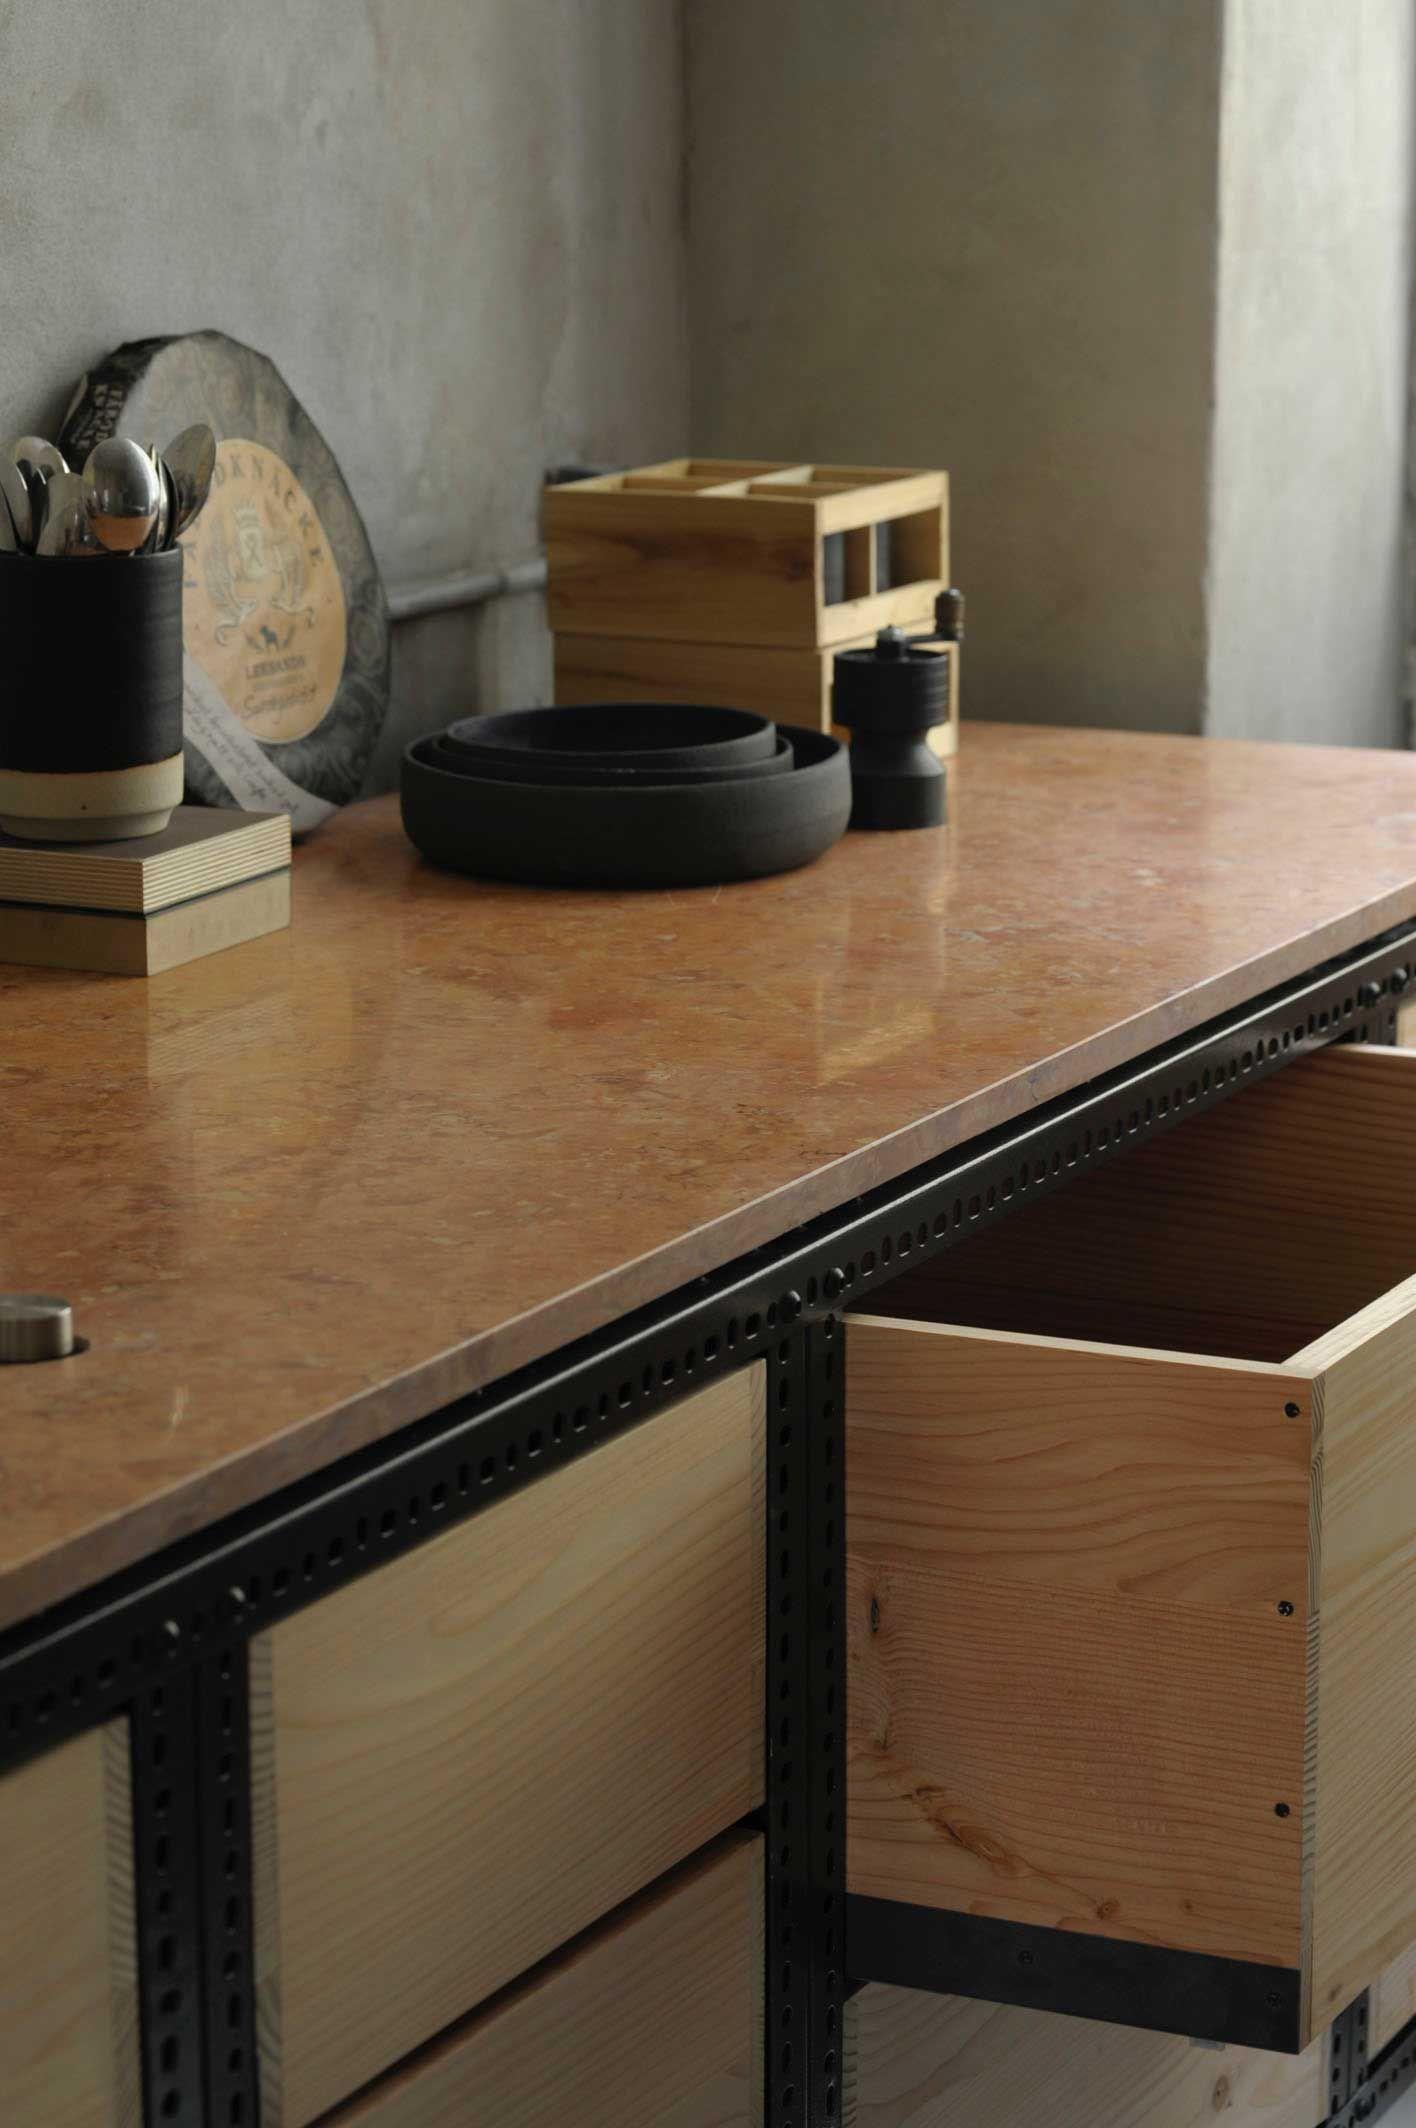 frama copenhagen studio kitchen steel frame and marbles frama copenhagen studio kitchenspace kitchenopen kitchendesign